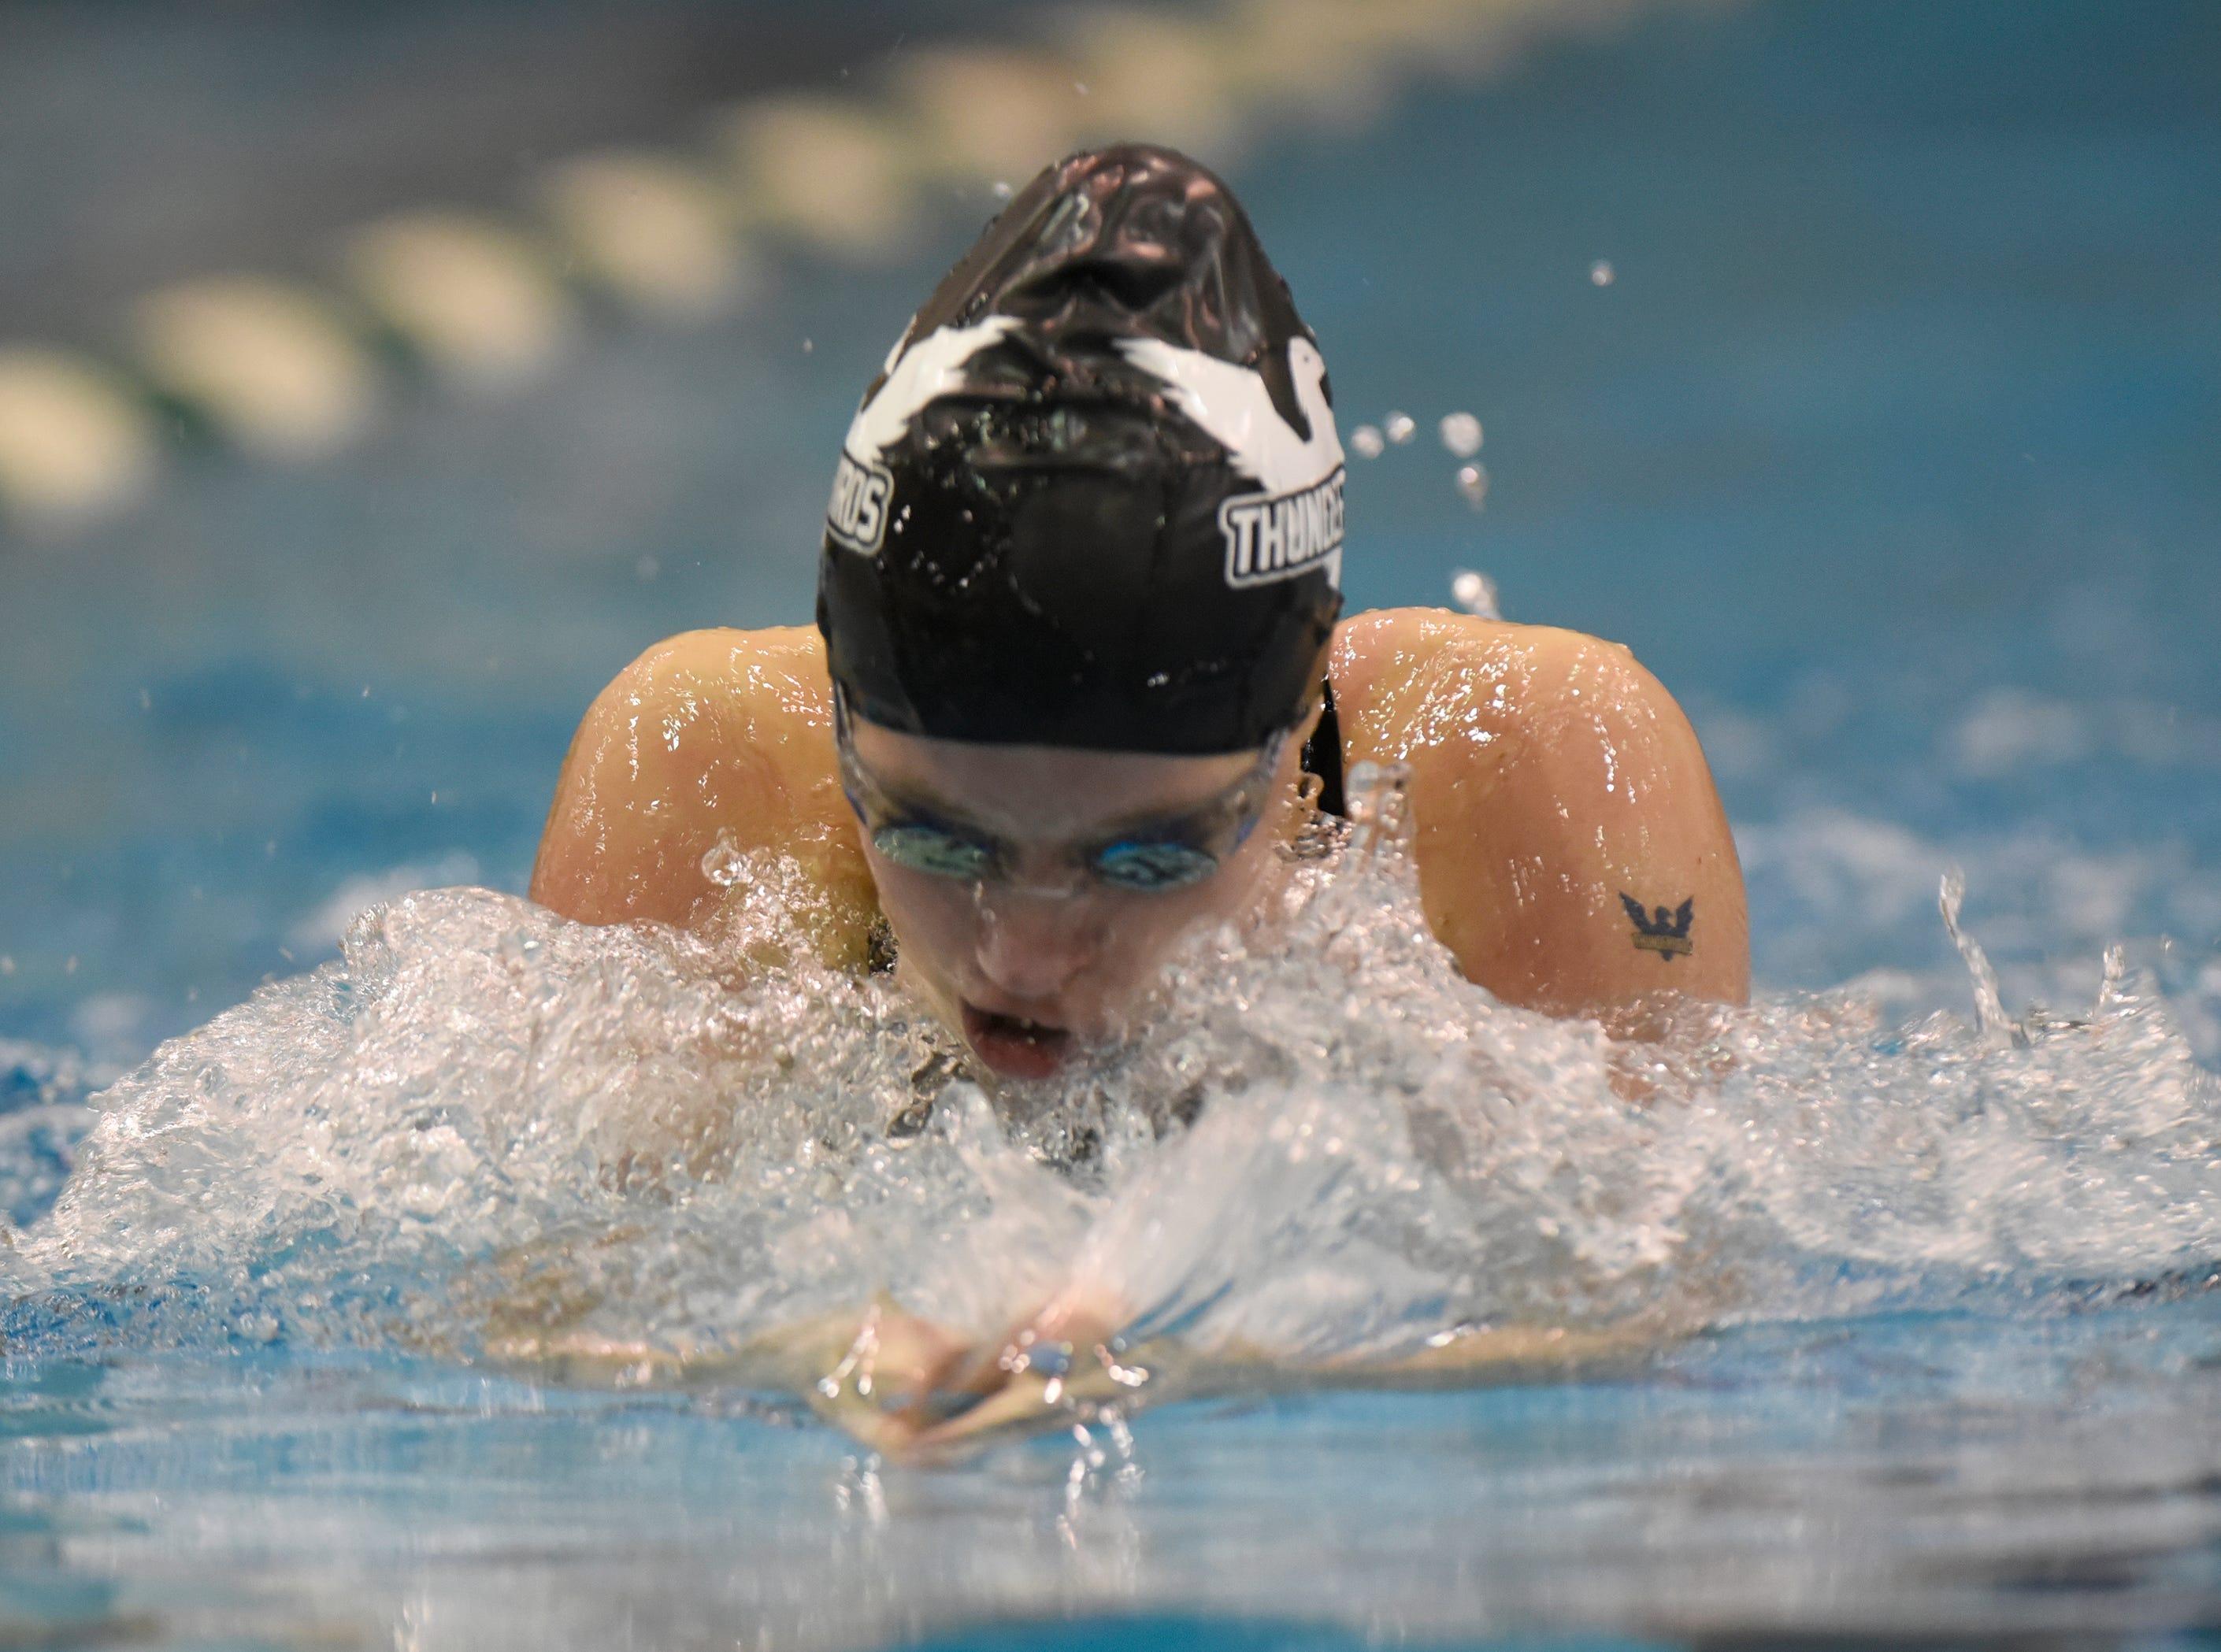 Harrison/Farmington's Dayna Borregar in the 100 yard breaststroke at the Division 1 girls swimming and diving championships held at Eastern Michigan University Nov. 17, 2018.